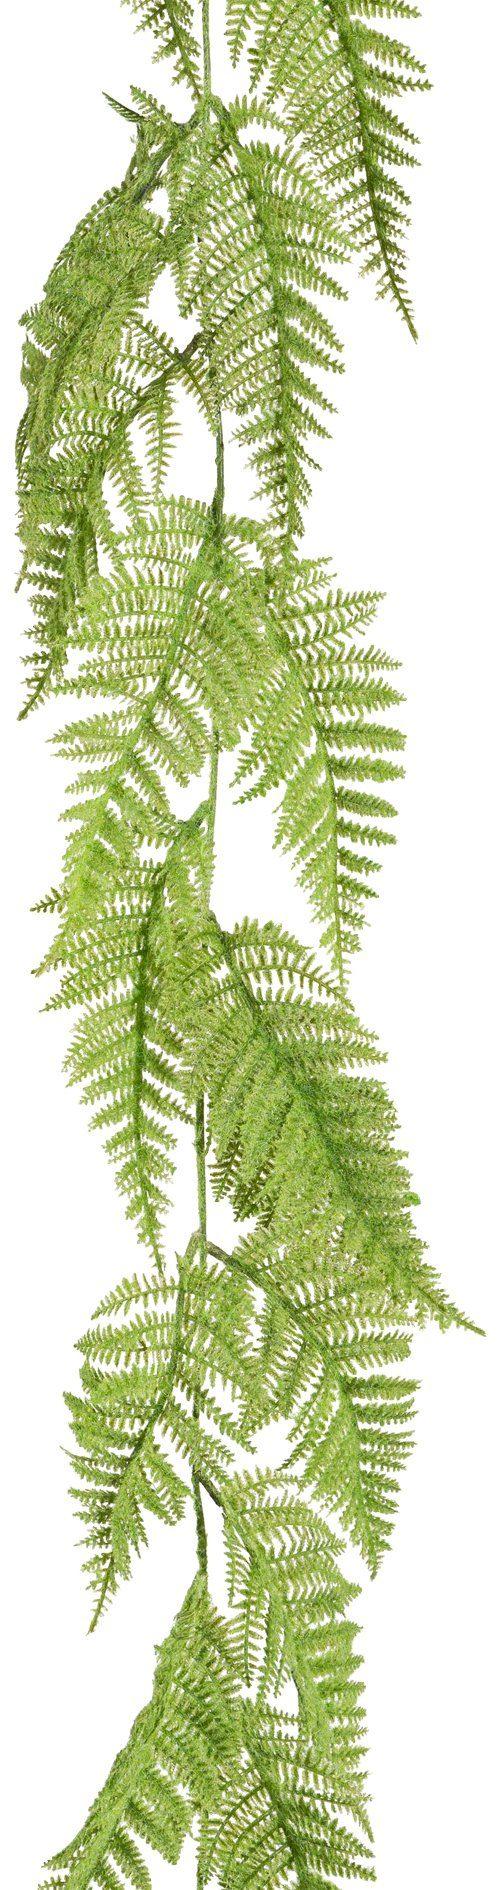 Kunstpflanze »Farn-Girlande«, Höhe 180 cm